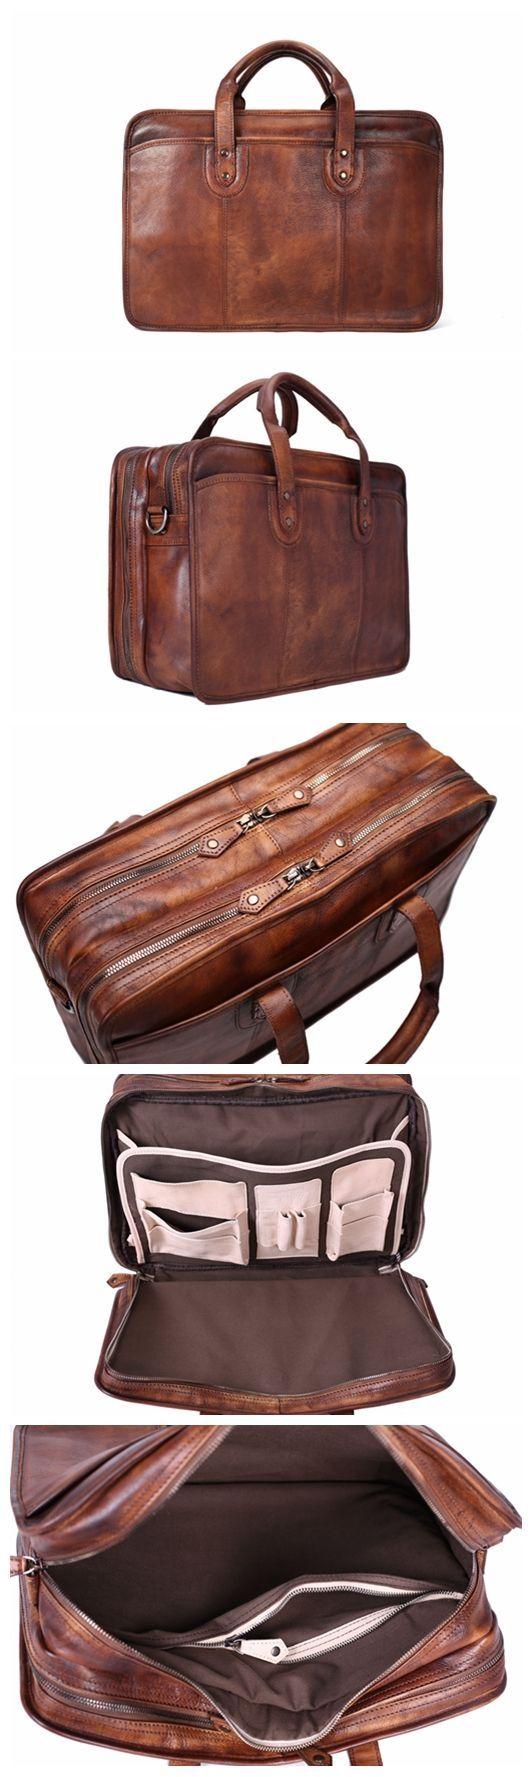 Handmade Vintage Full Grain Leather Mens Briefcase, 16'' Laptop Bag, Business Handbag